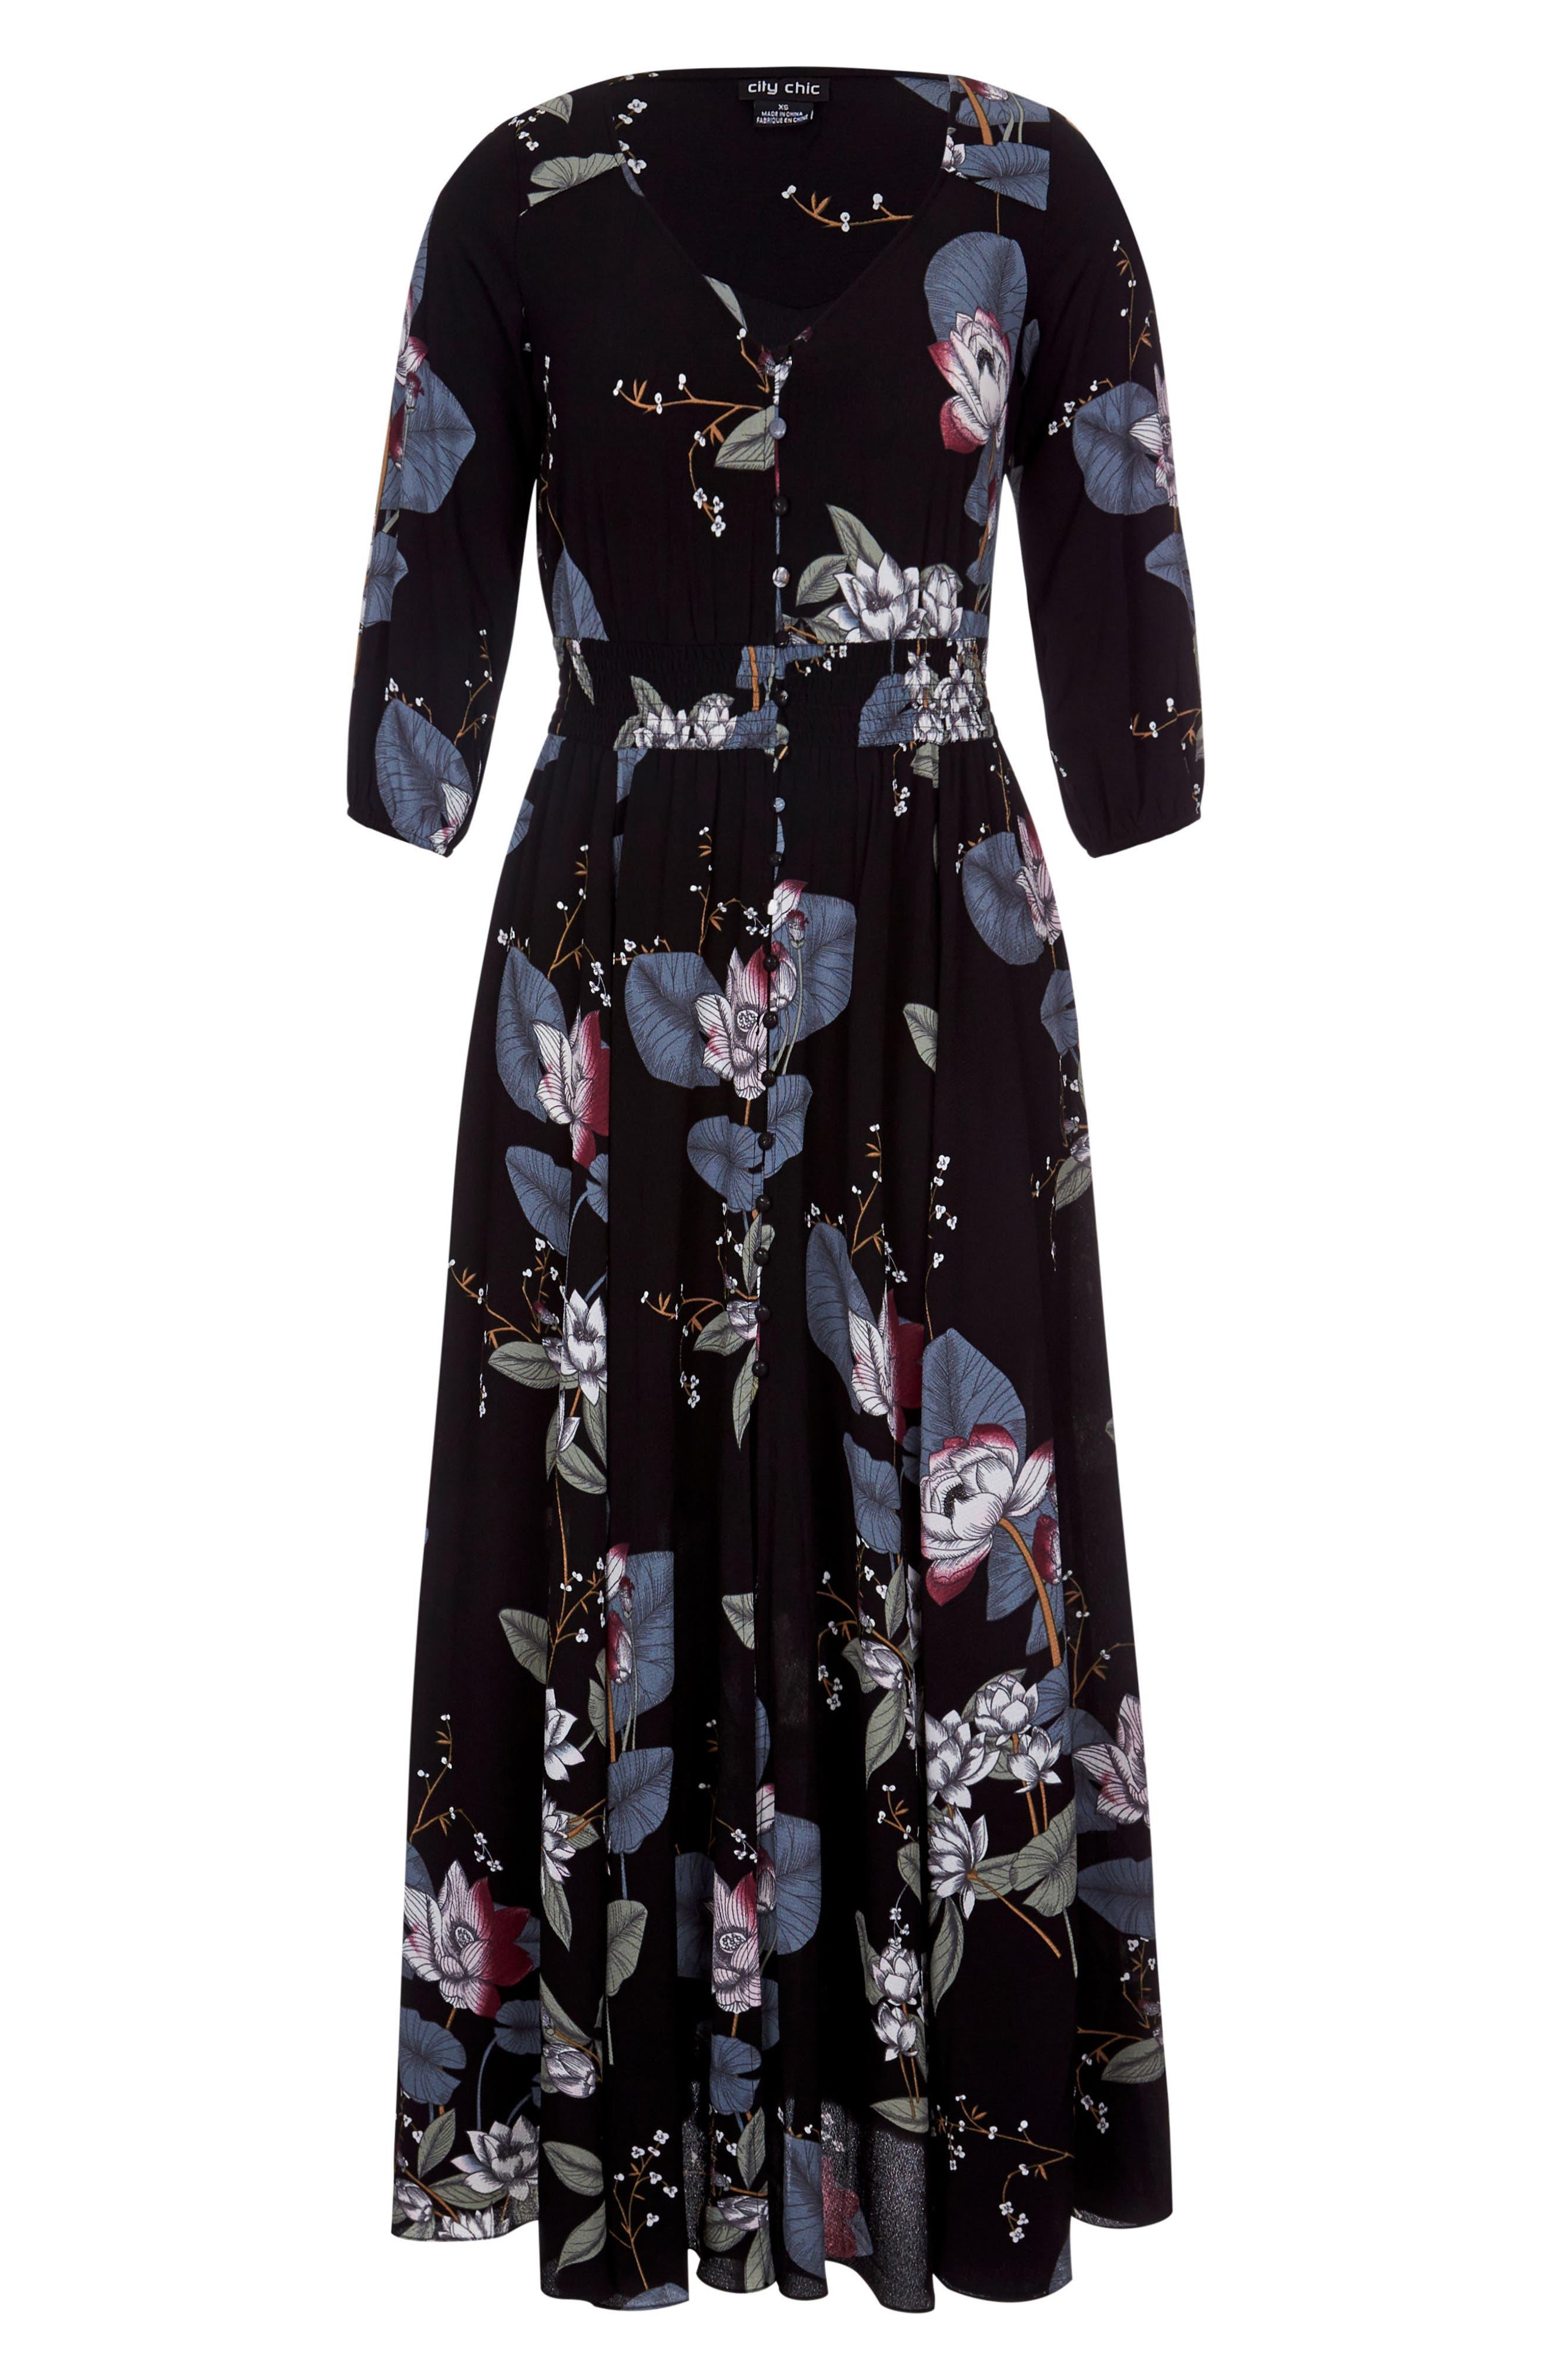 CITY CHIC, Blossom Maxi Dress, Alternate thumbnail 3, color, BLOSSOM